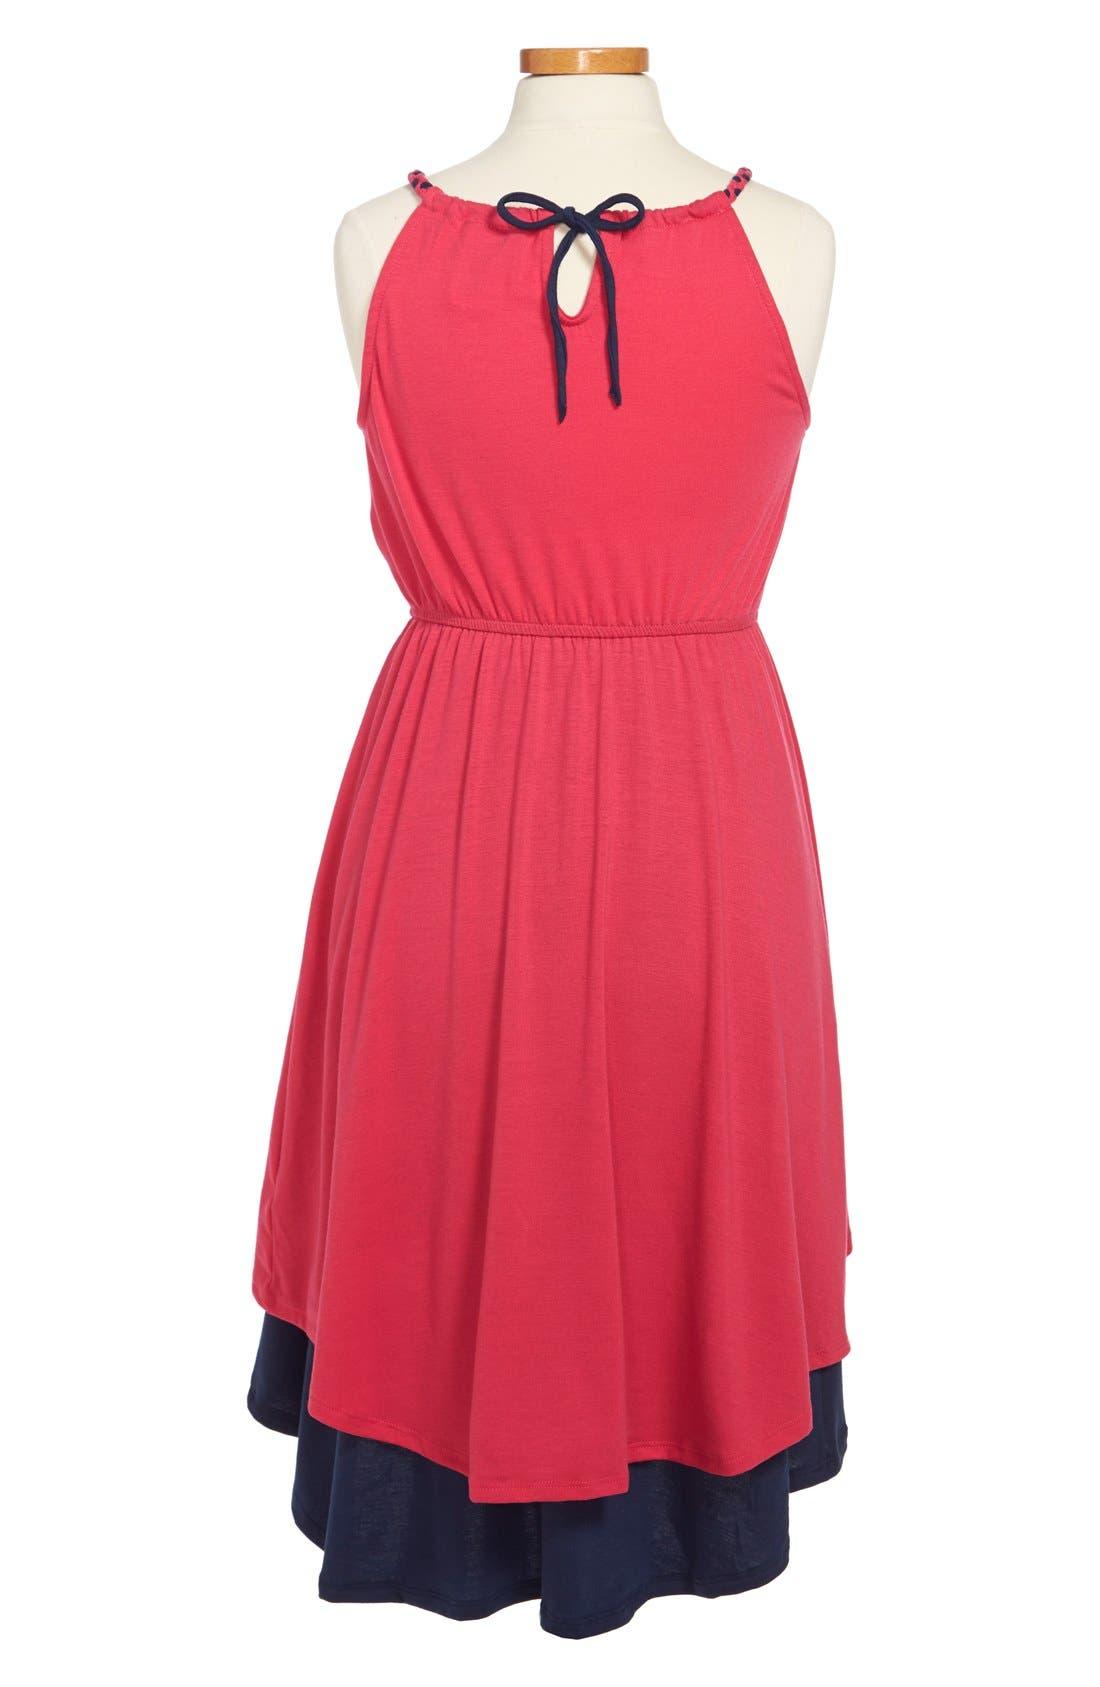 Alternate Image 2  - Paper Doll Colorblock Tulip Skirt Dress (Little Girls & Big Girls)